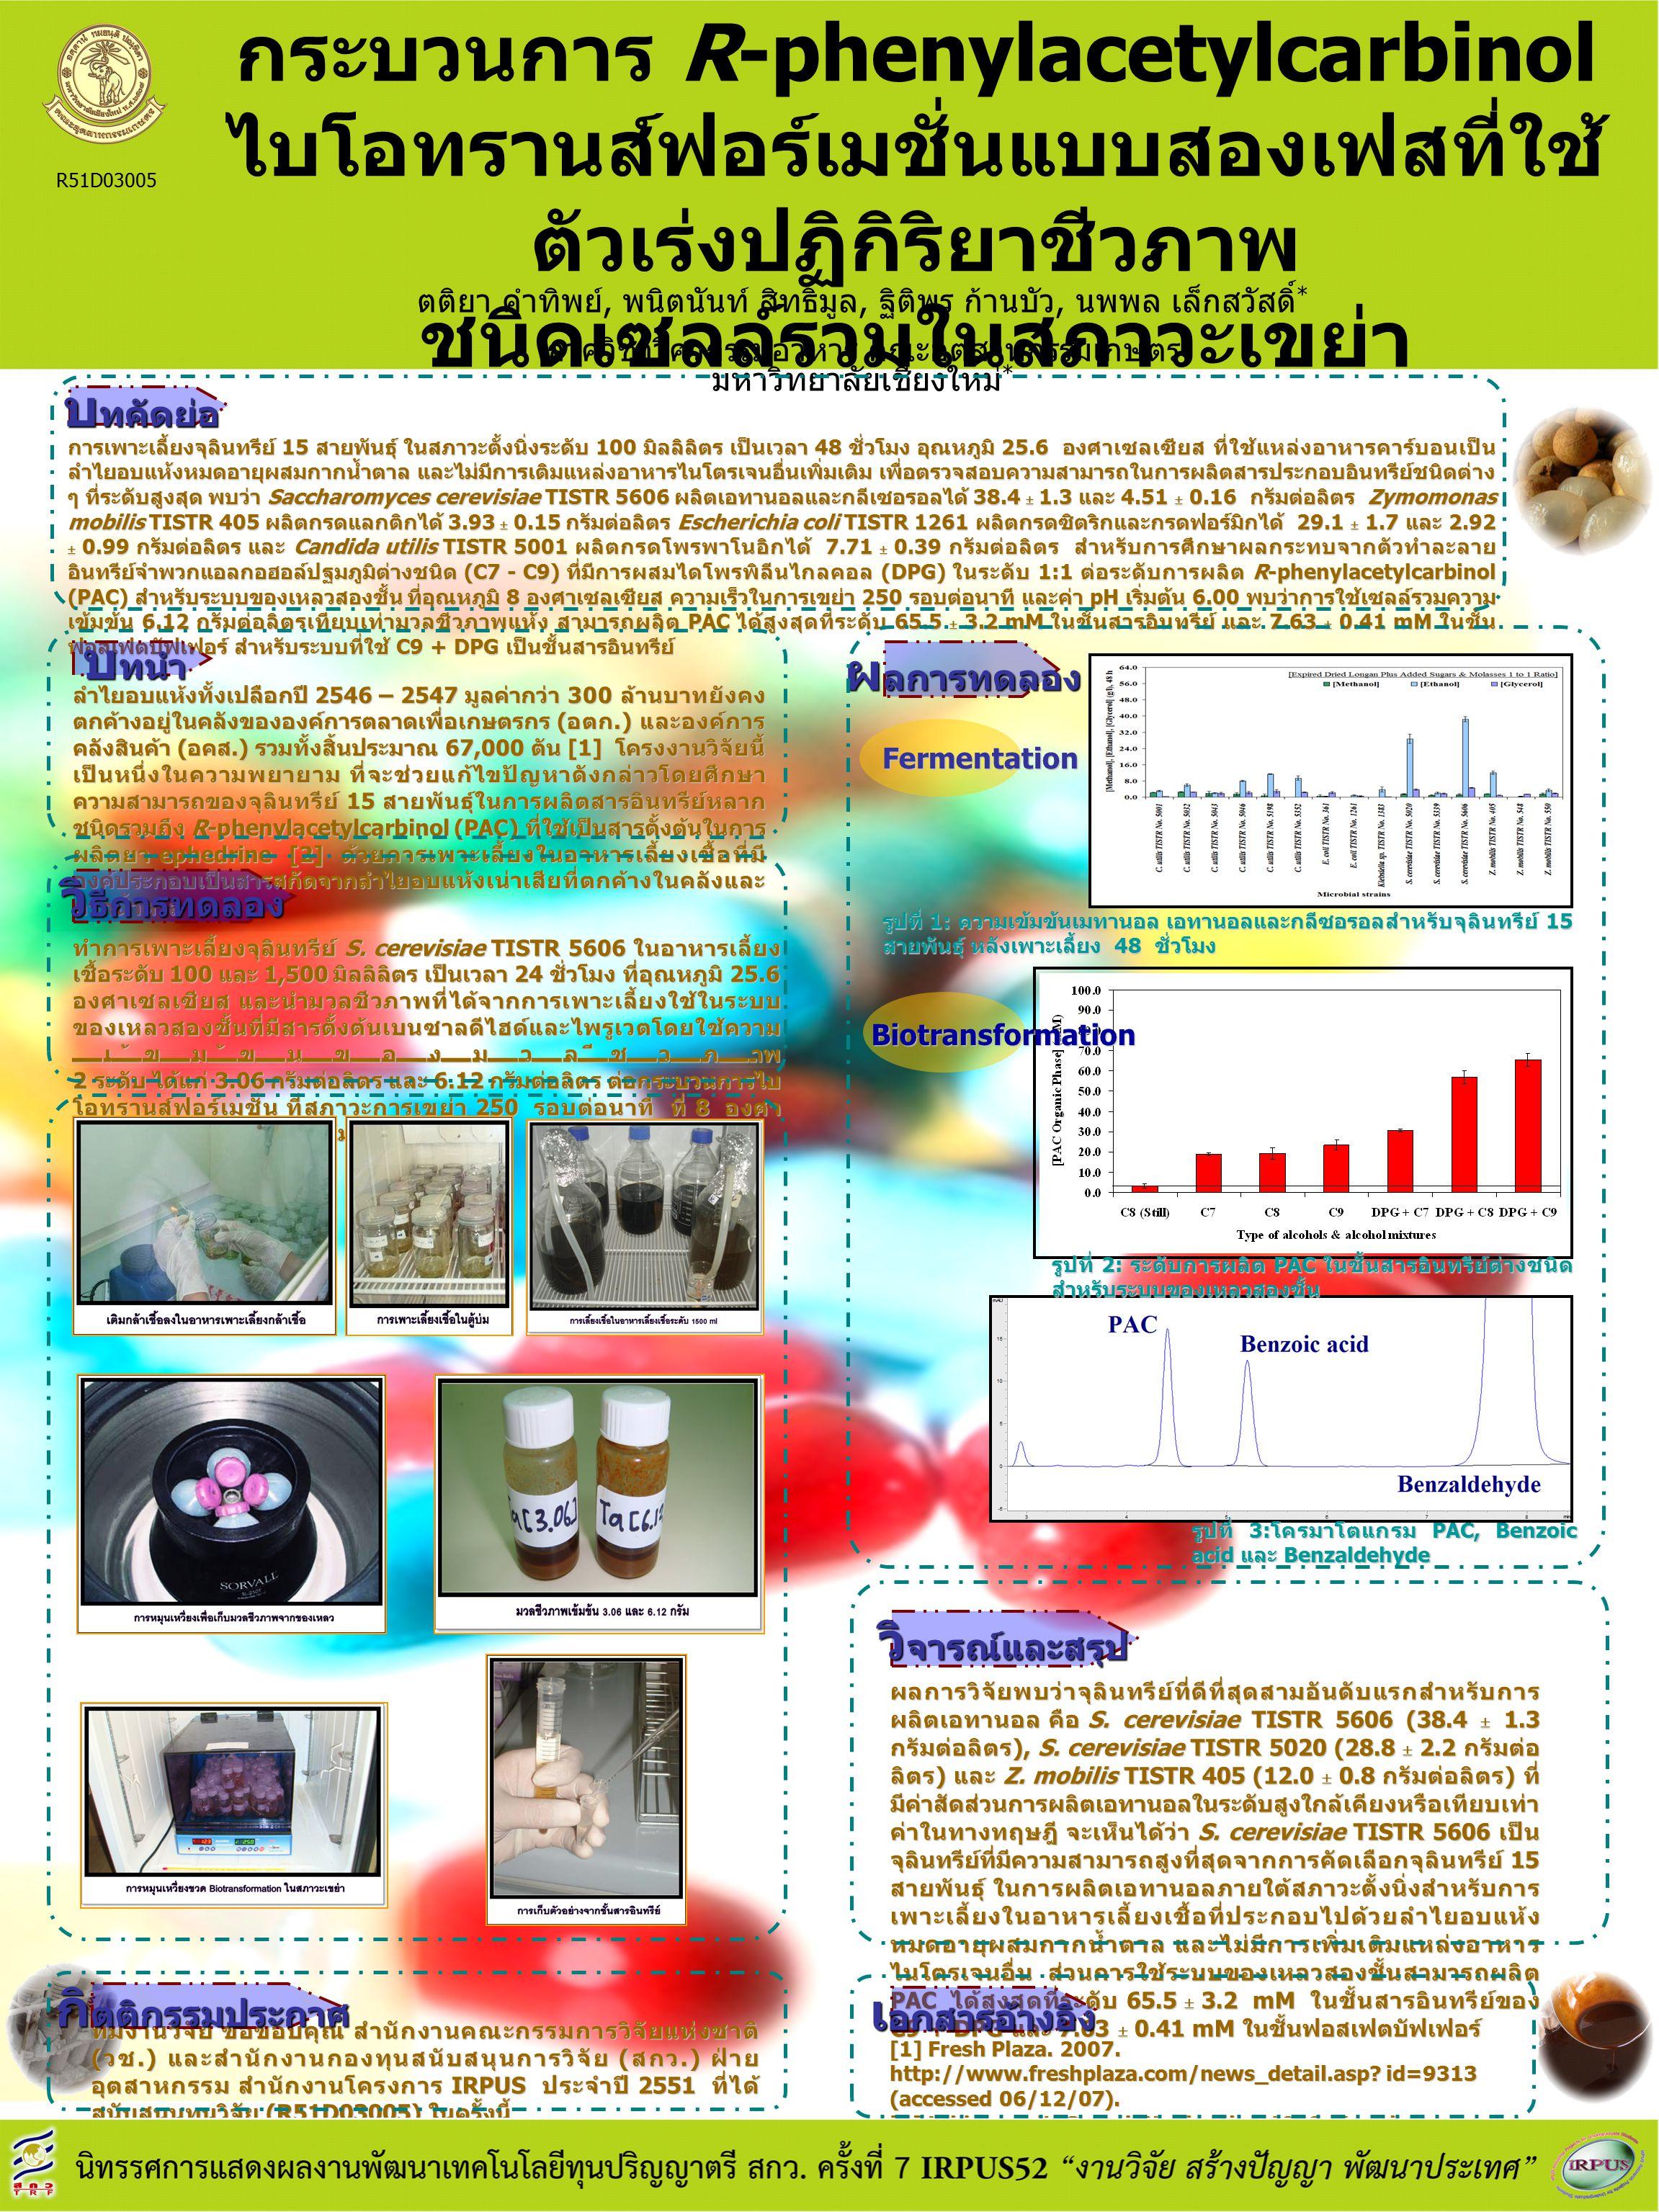 R51D03005 กระบวนการ R-phenylacetylcarbinol ไบโอทรานส์ฟอร์เมชั่นแบบสองเฟสที่ใช้ ตัวเร่งปฏิกิริยาชีวภาพ ชนิดเซลล์รวมในสภาวะเขย่า ตติยา คำทิพย์, พนิตนันท